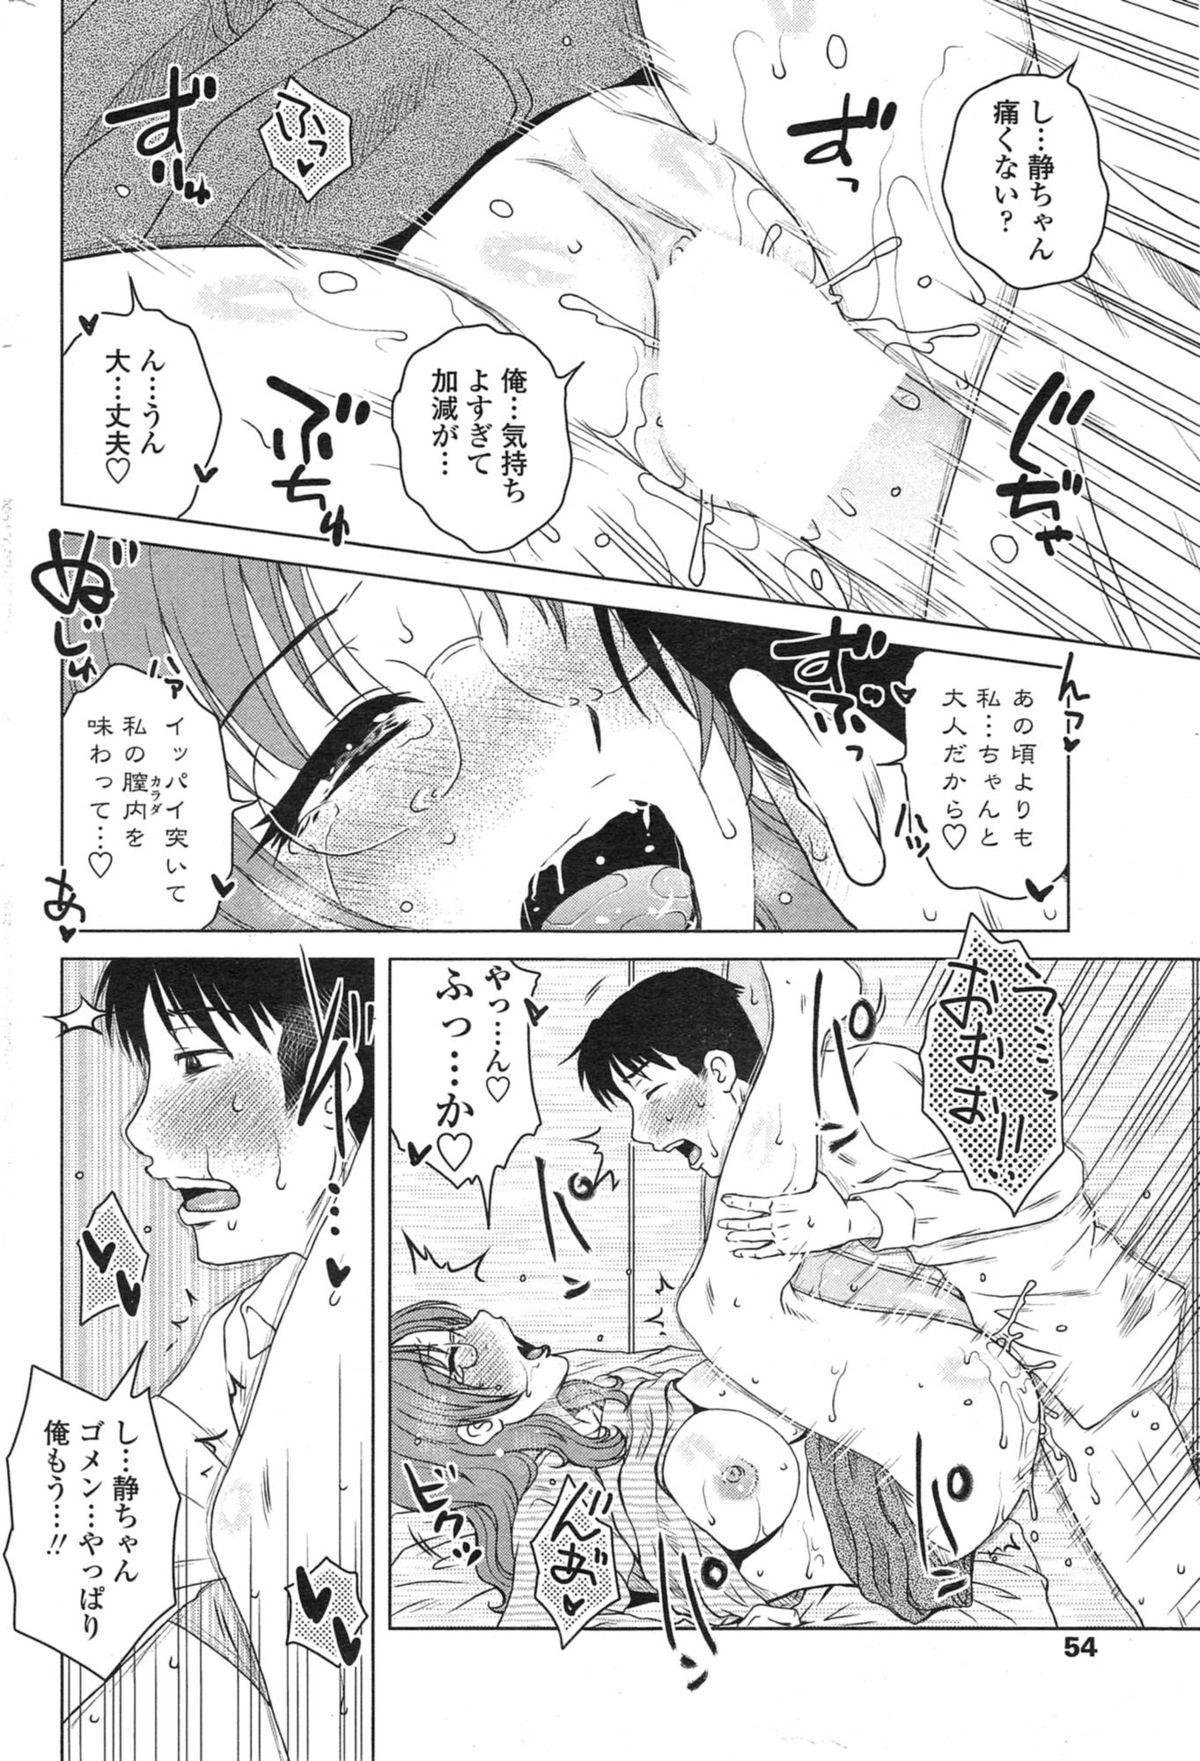 [Kurumiya Mashimin] Mikkai-chuu ni Tsuki Ch.1-6 118